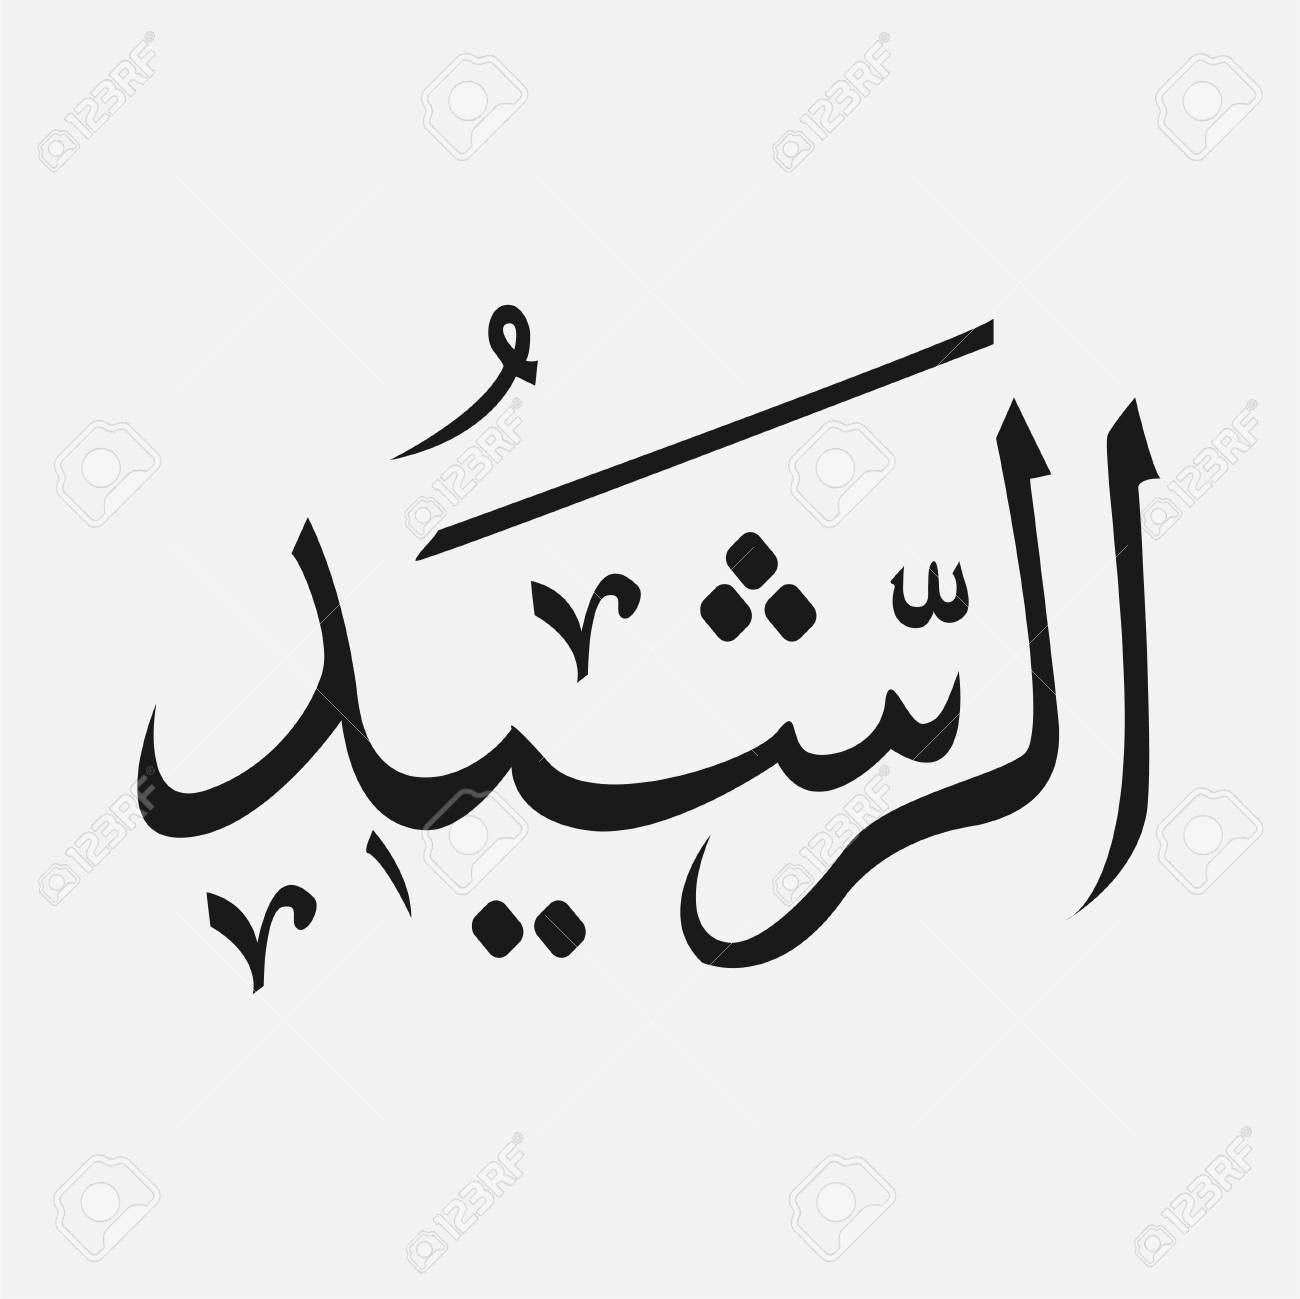 Allah Écrit En Arabe nom de dieu de l'islam - allah en arabe écrit, nom de dieu en arabe